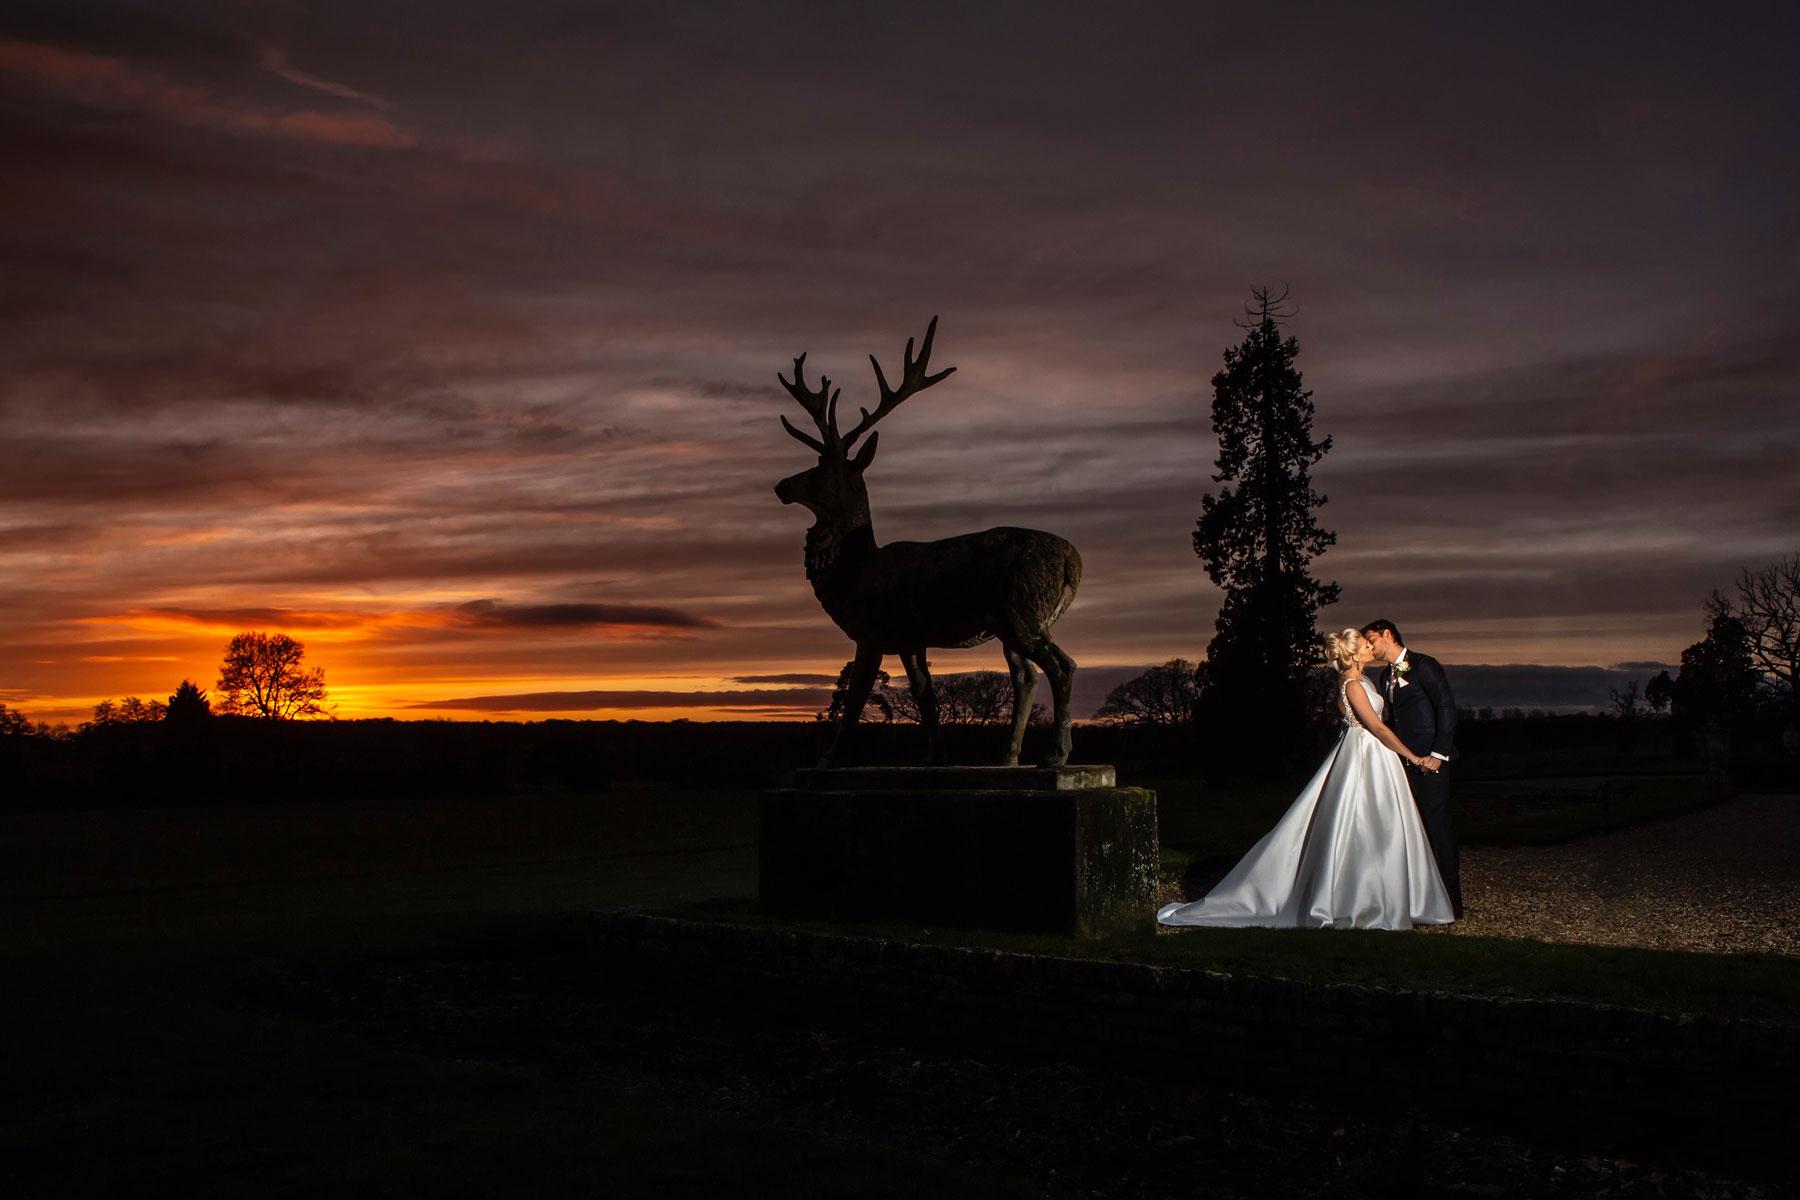 Gosfield-Hall-Weddings-in-Essex